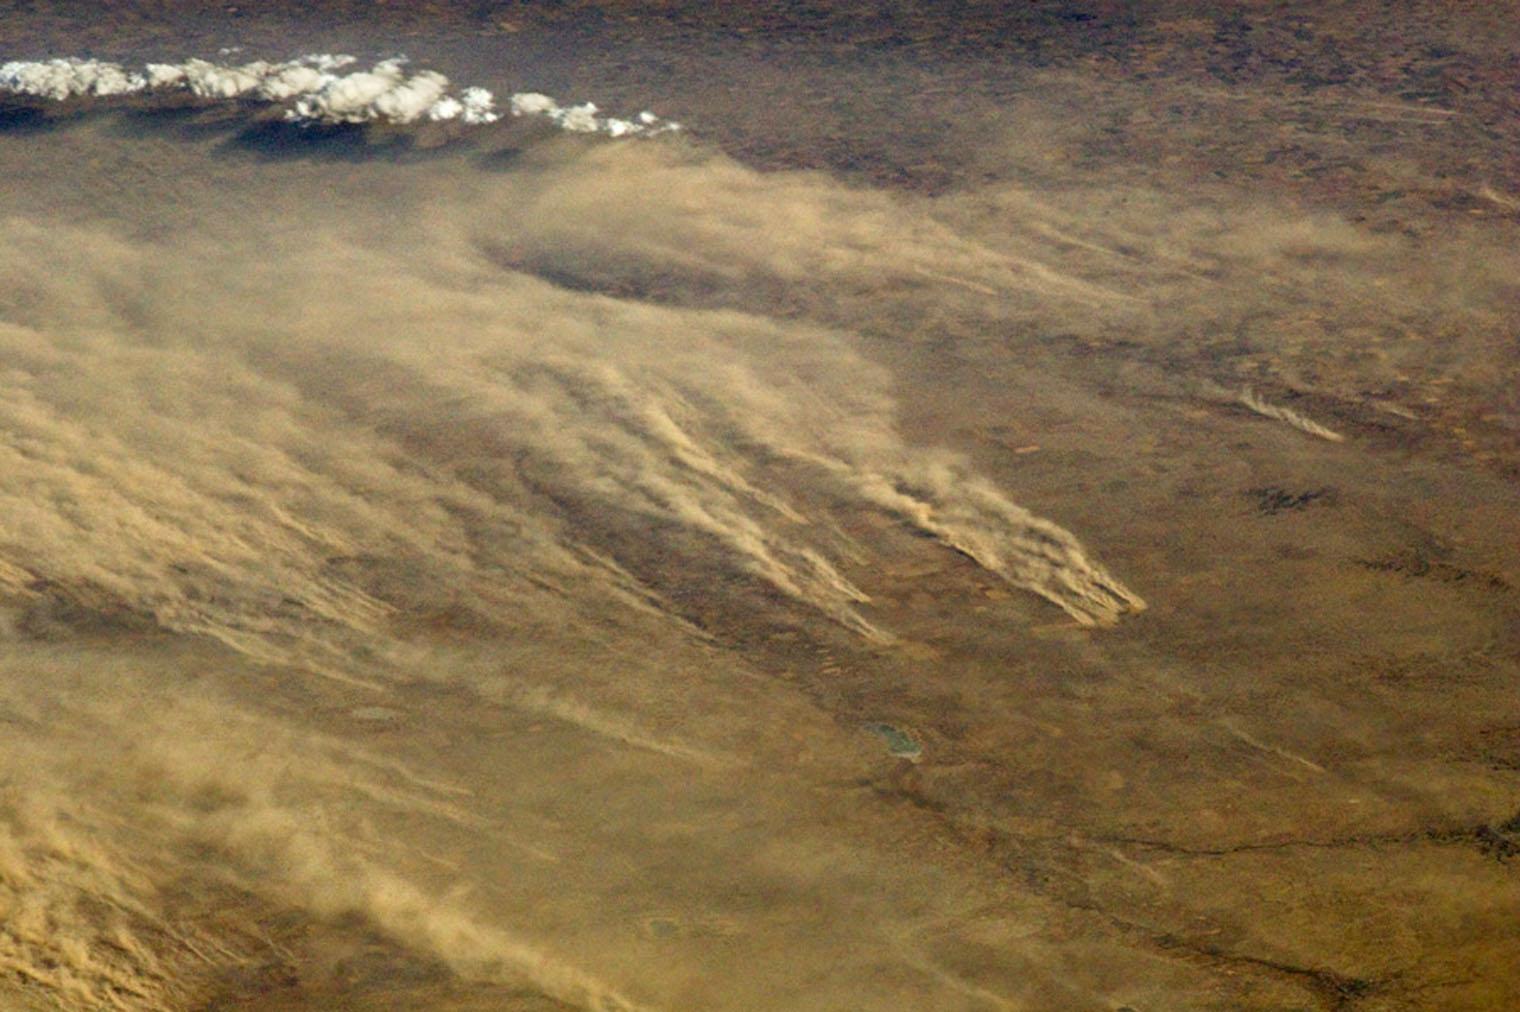 Sandstorm, northwestern USA